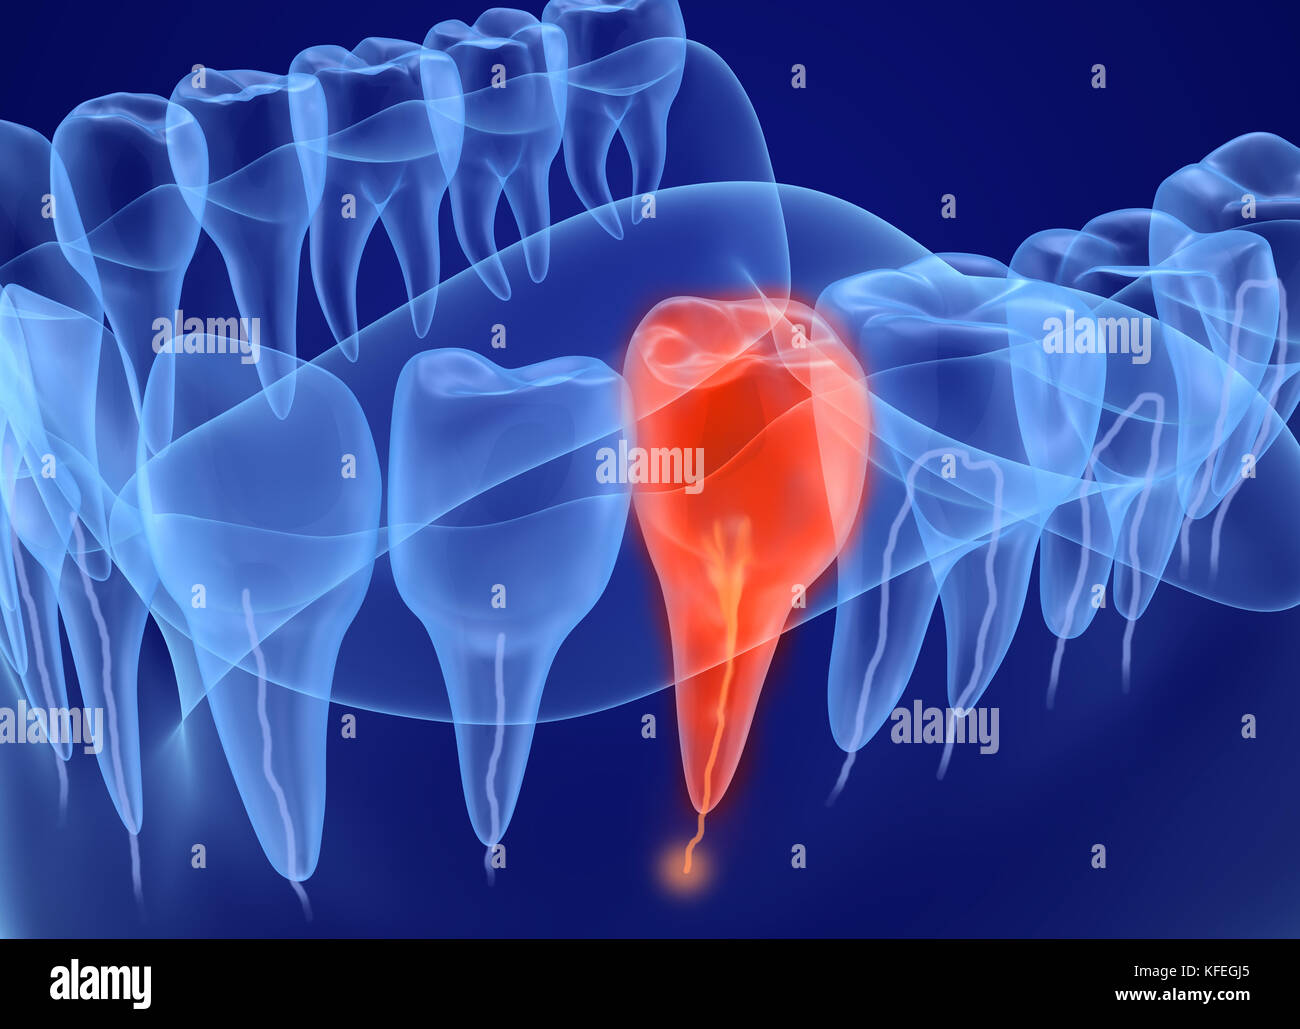 Dentin Stockfotos & Dentin Bilder - Alamy